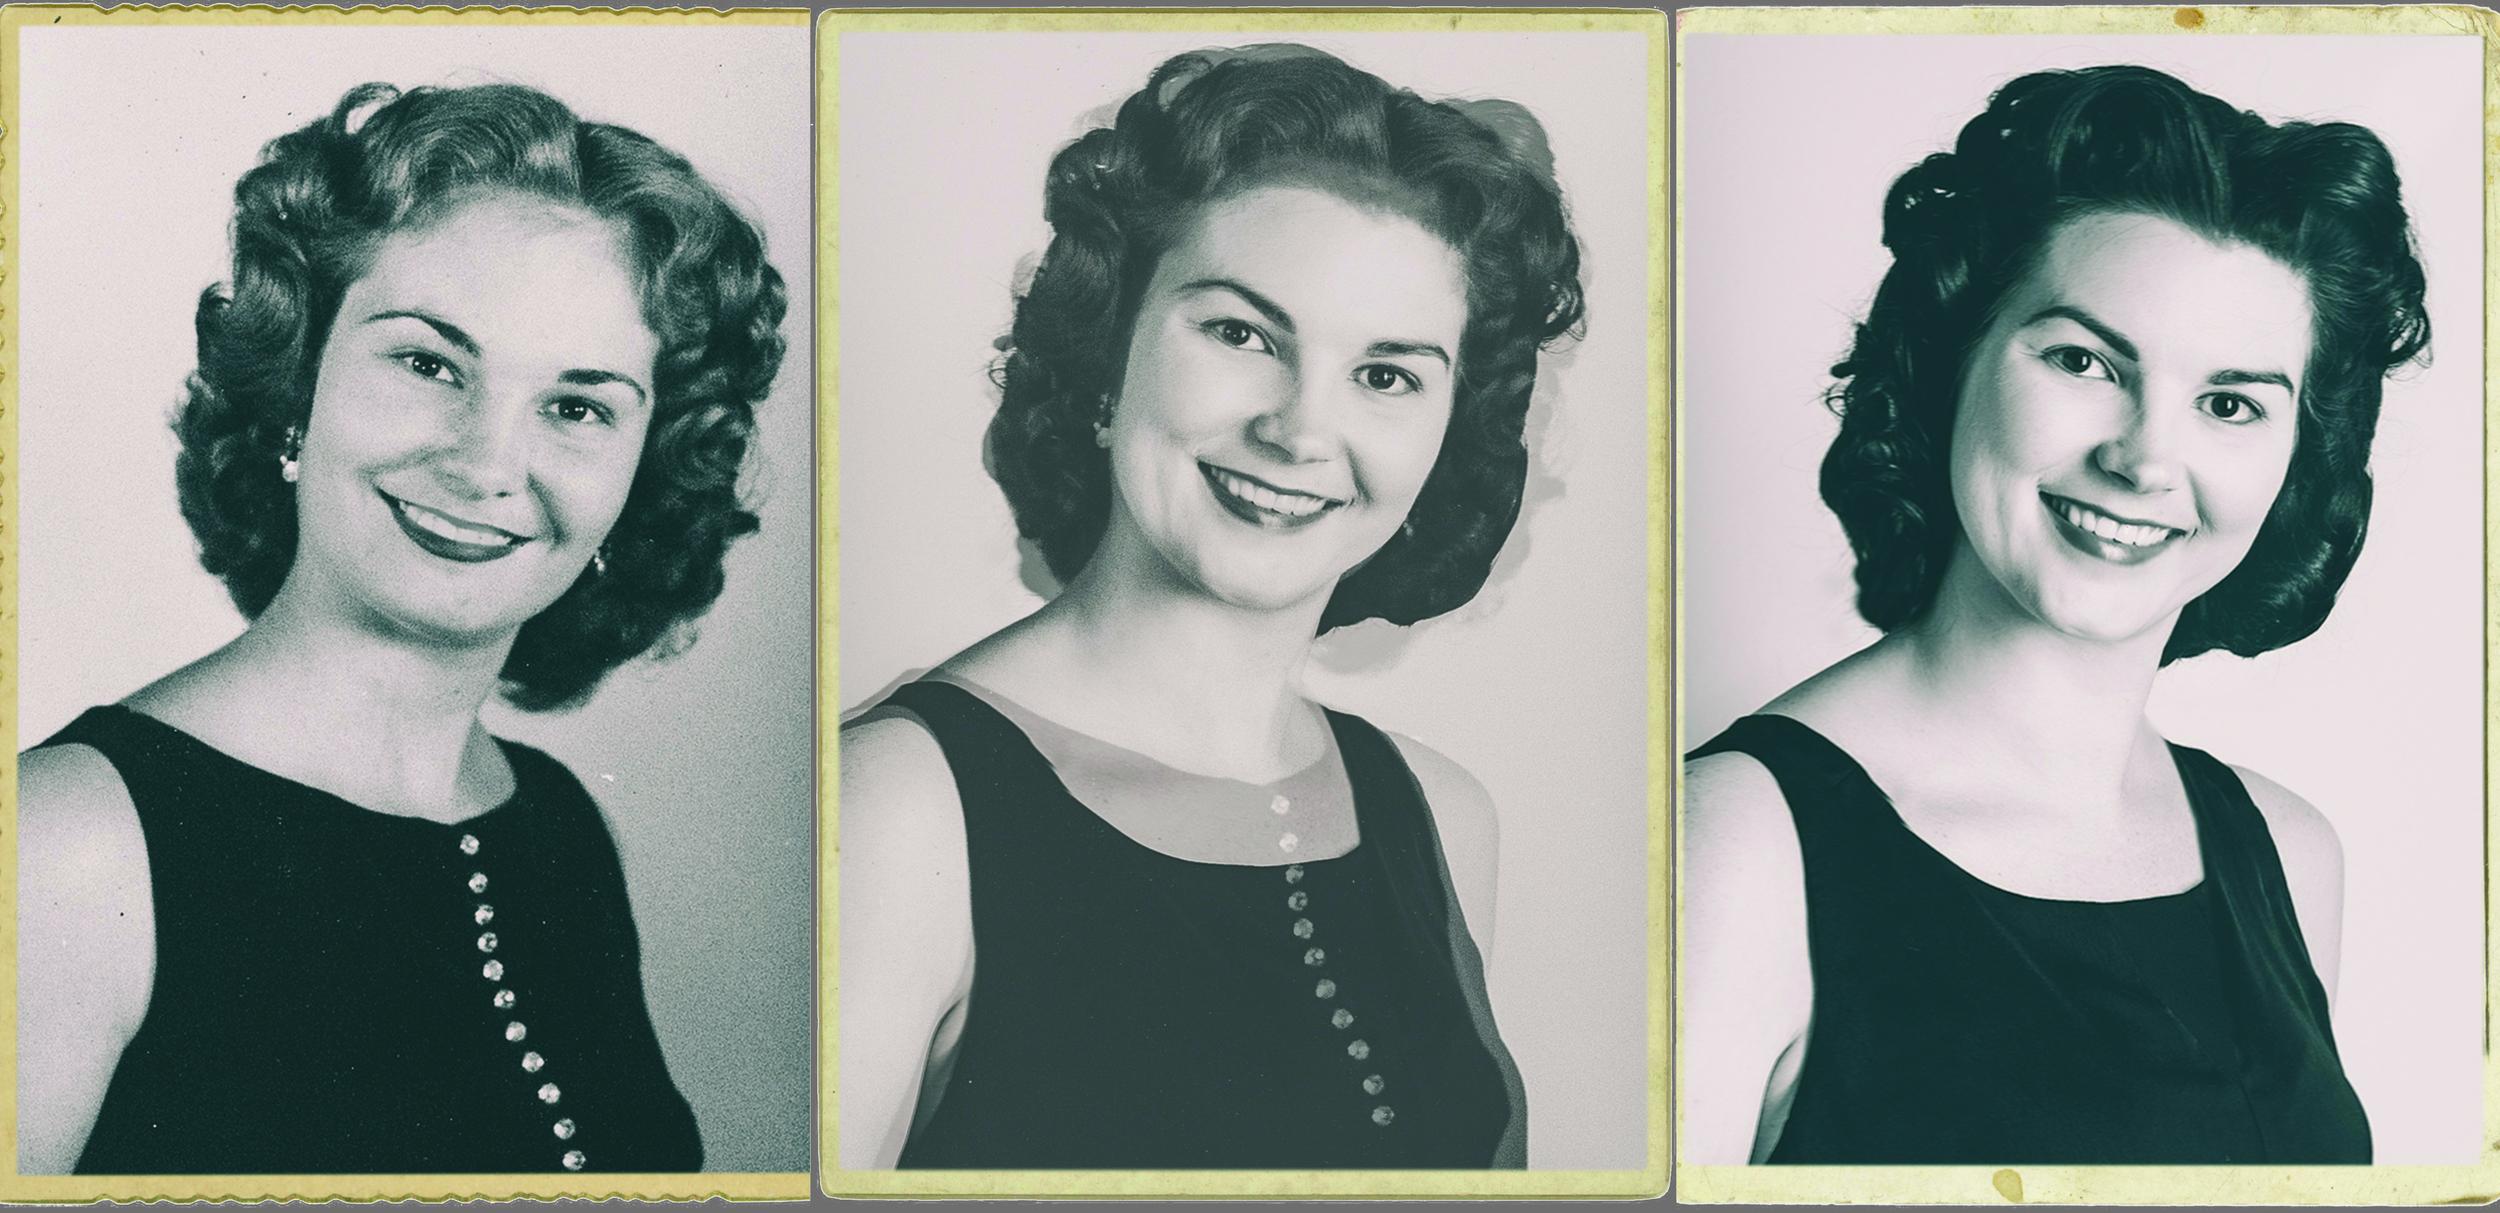 Left: Karen Kelly, age 17 (1958) Center: Composited Portrait  Right: Lindsey, Today